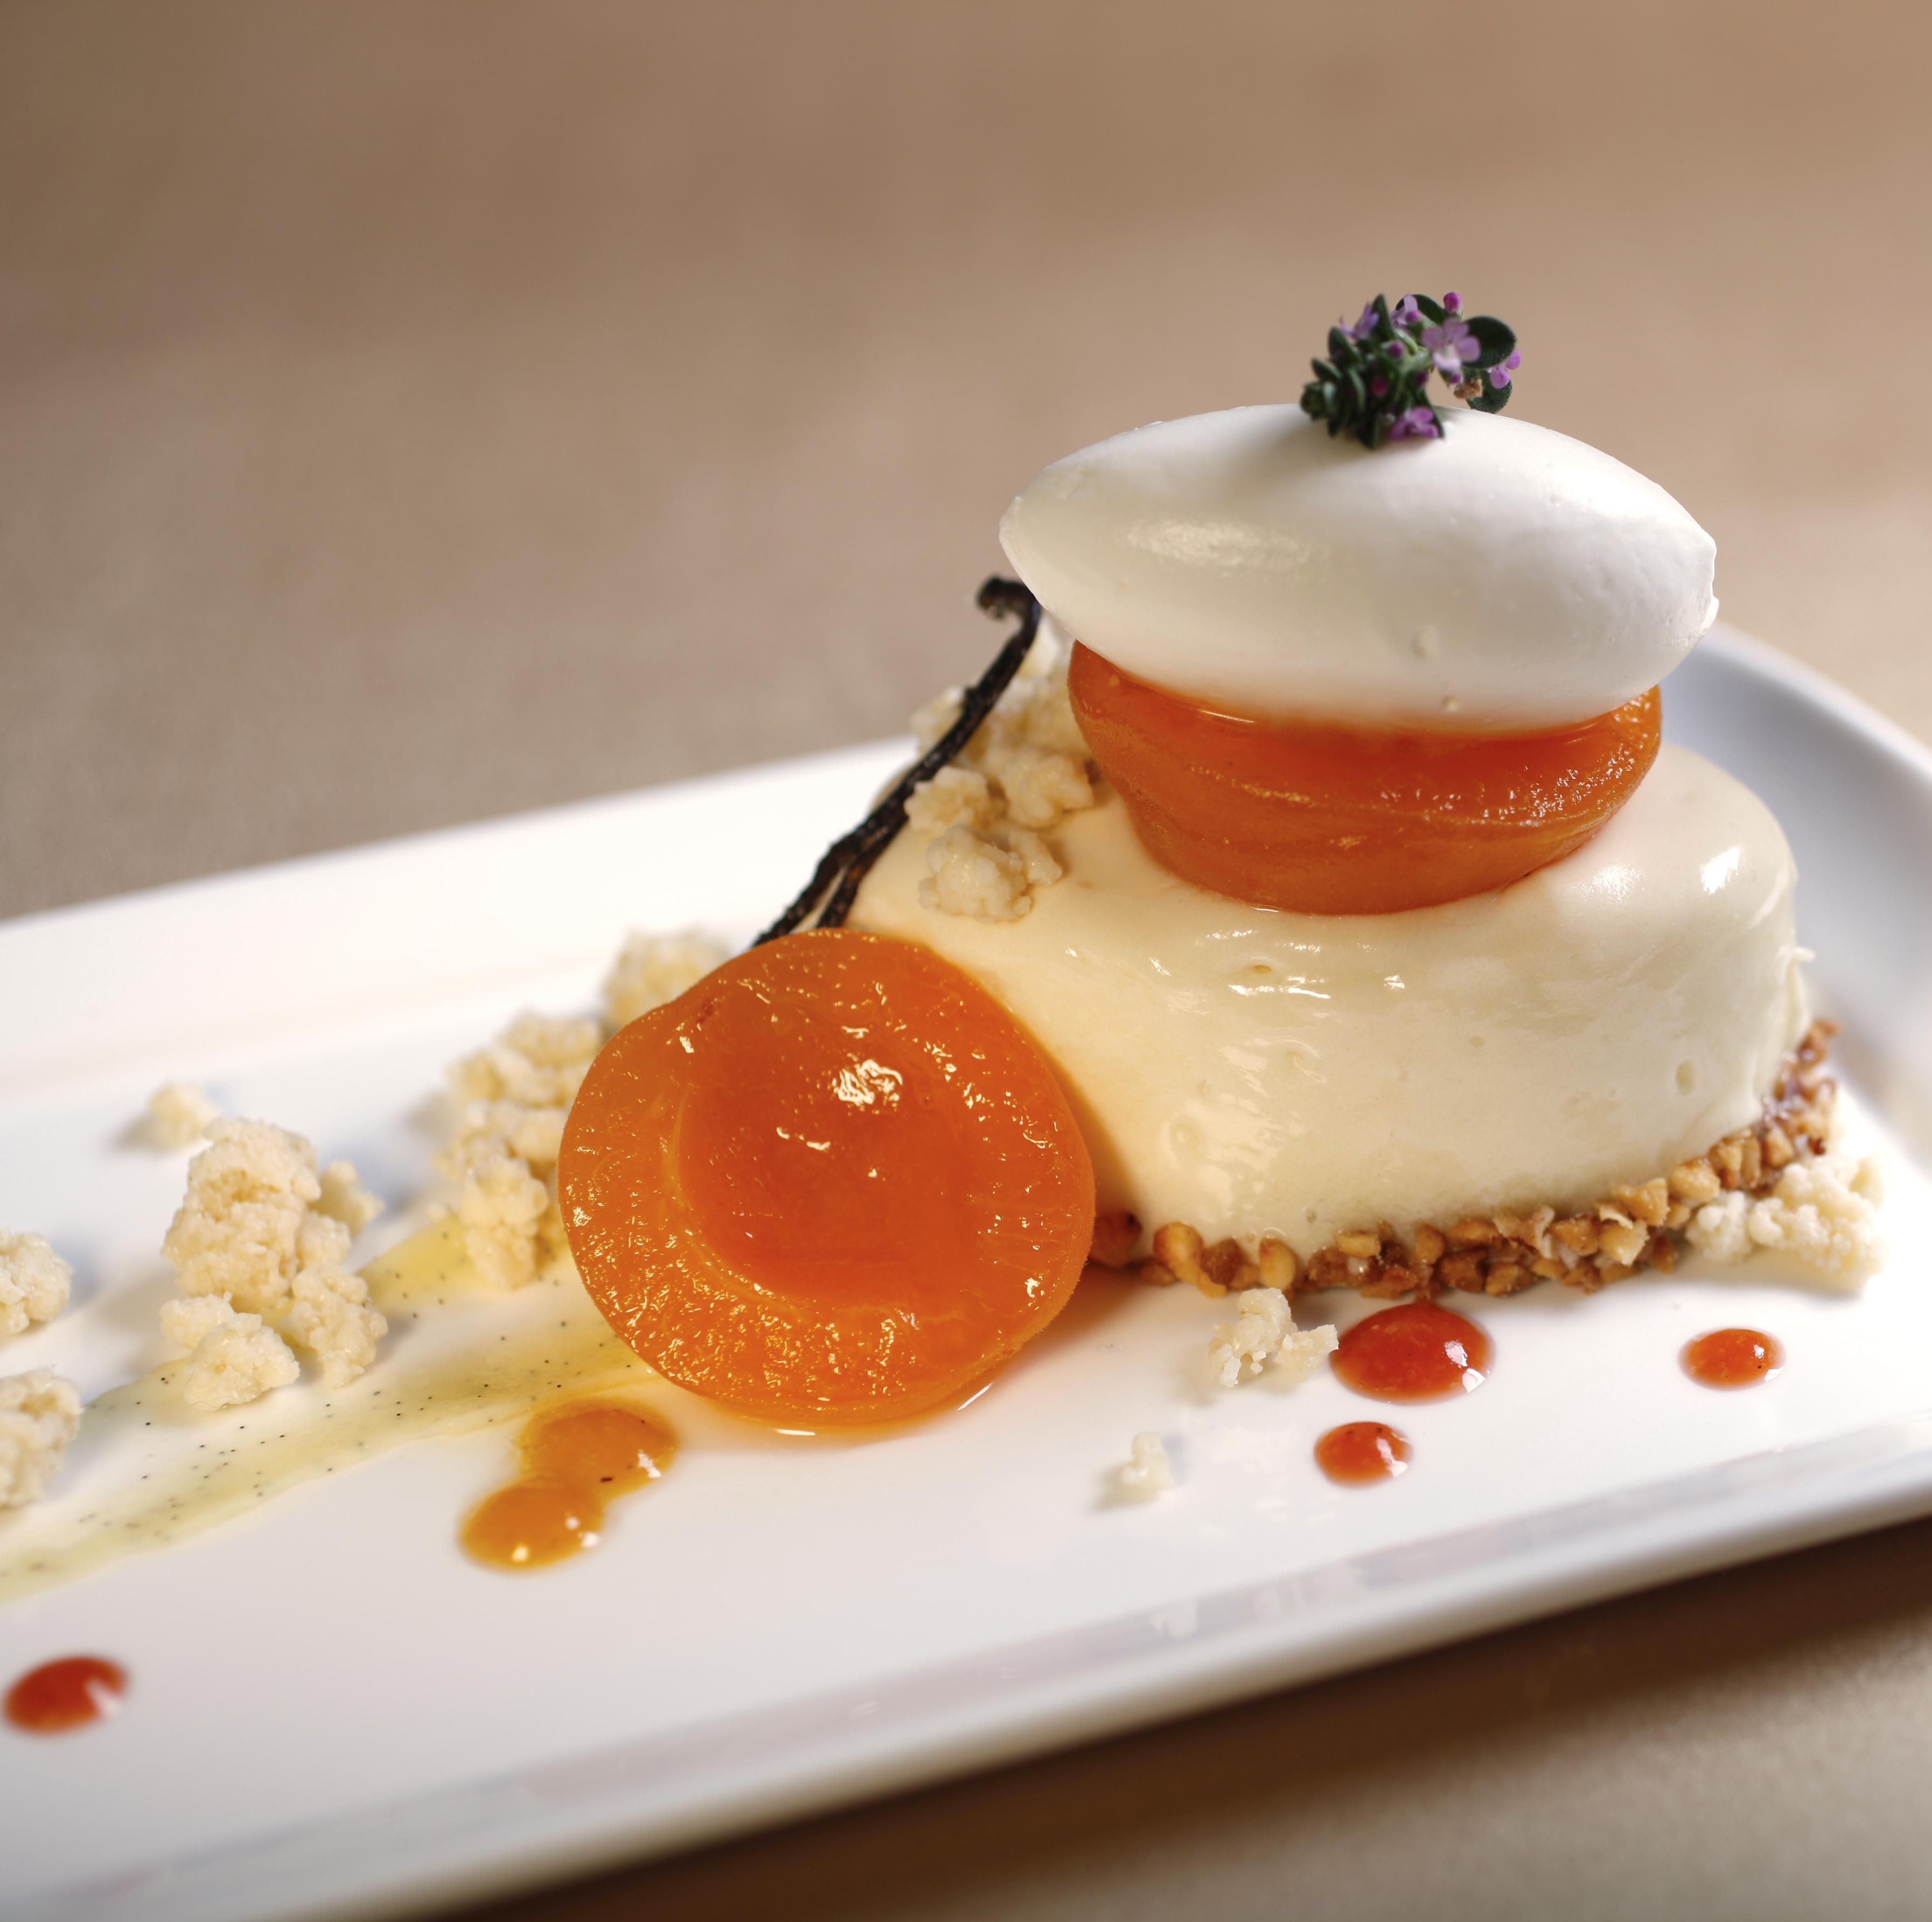 Apricot Cheescake